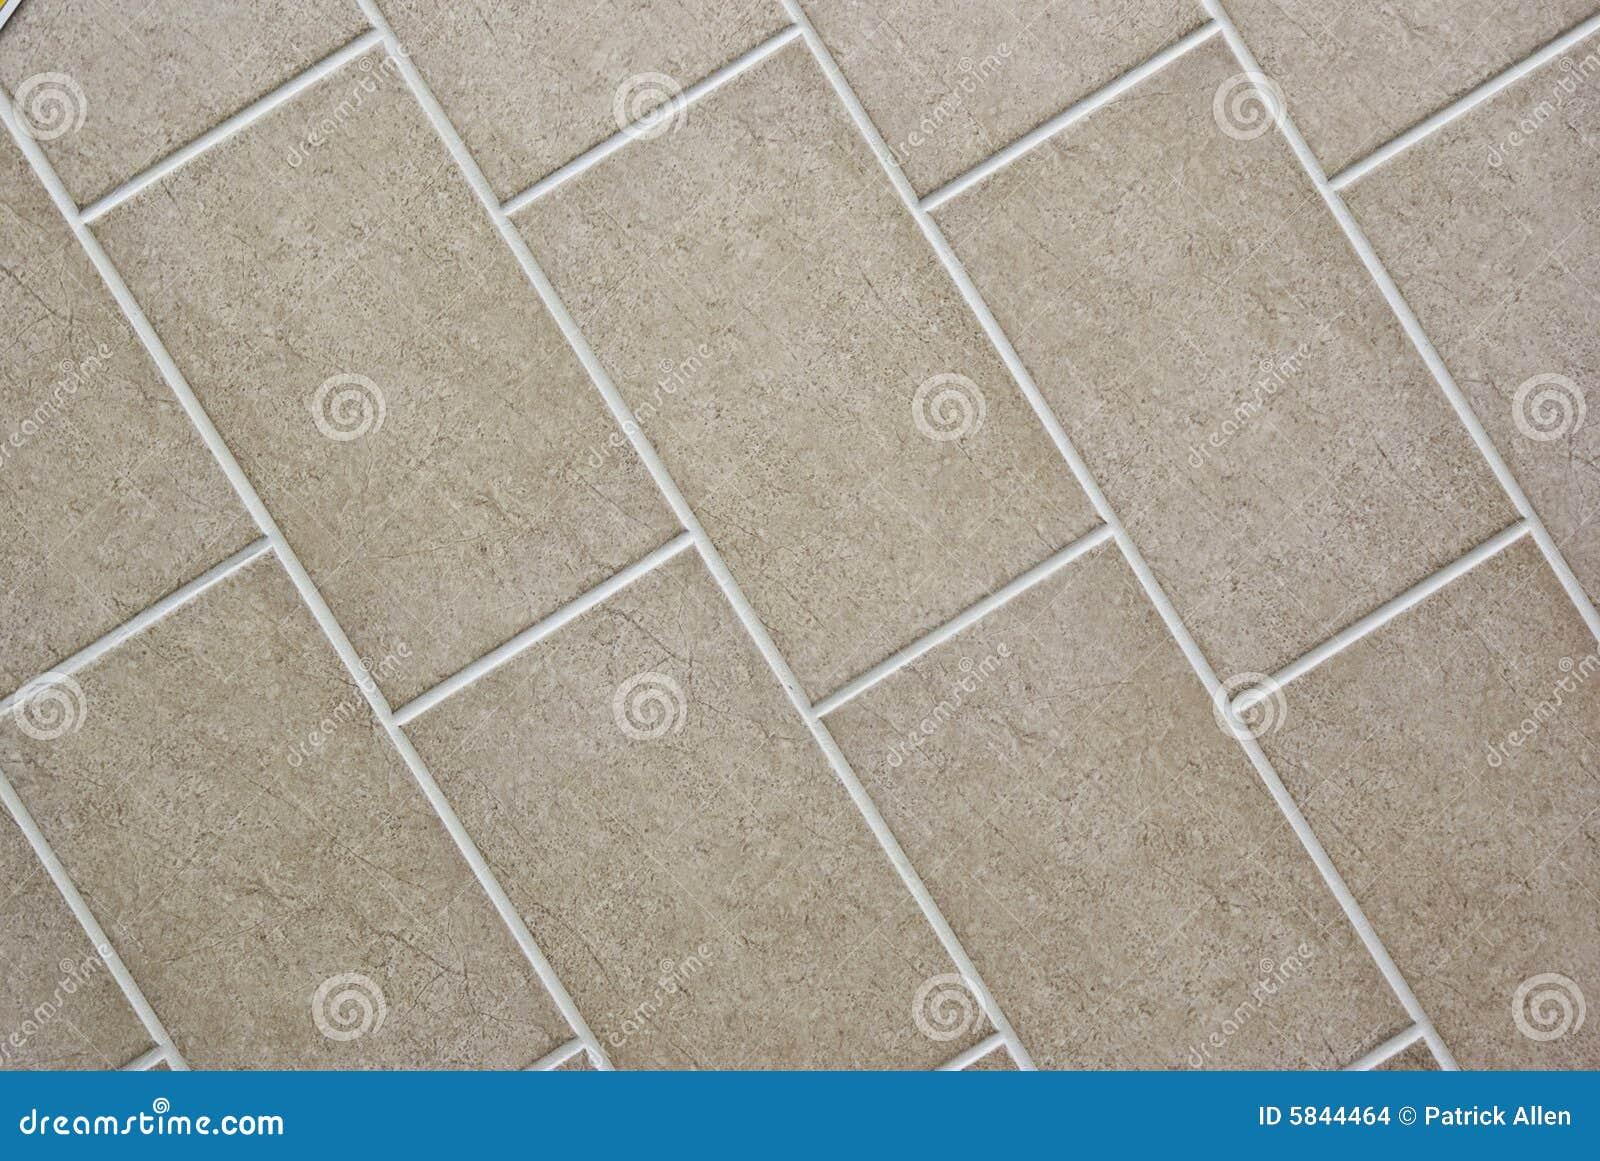 Rectangular Floor Plans